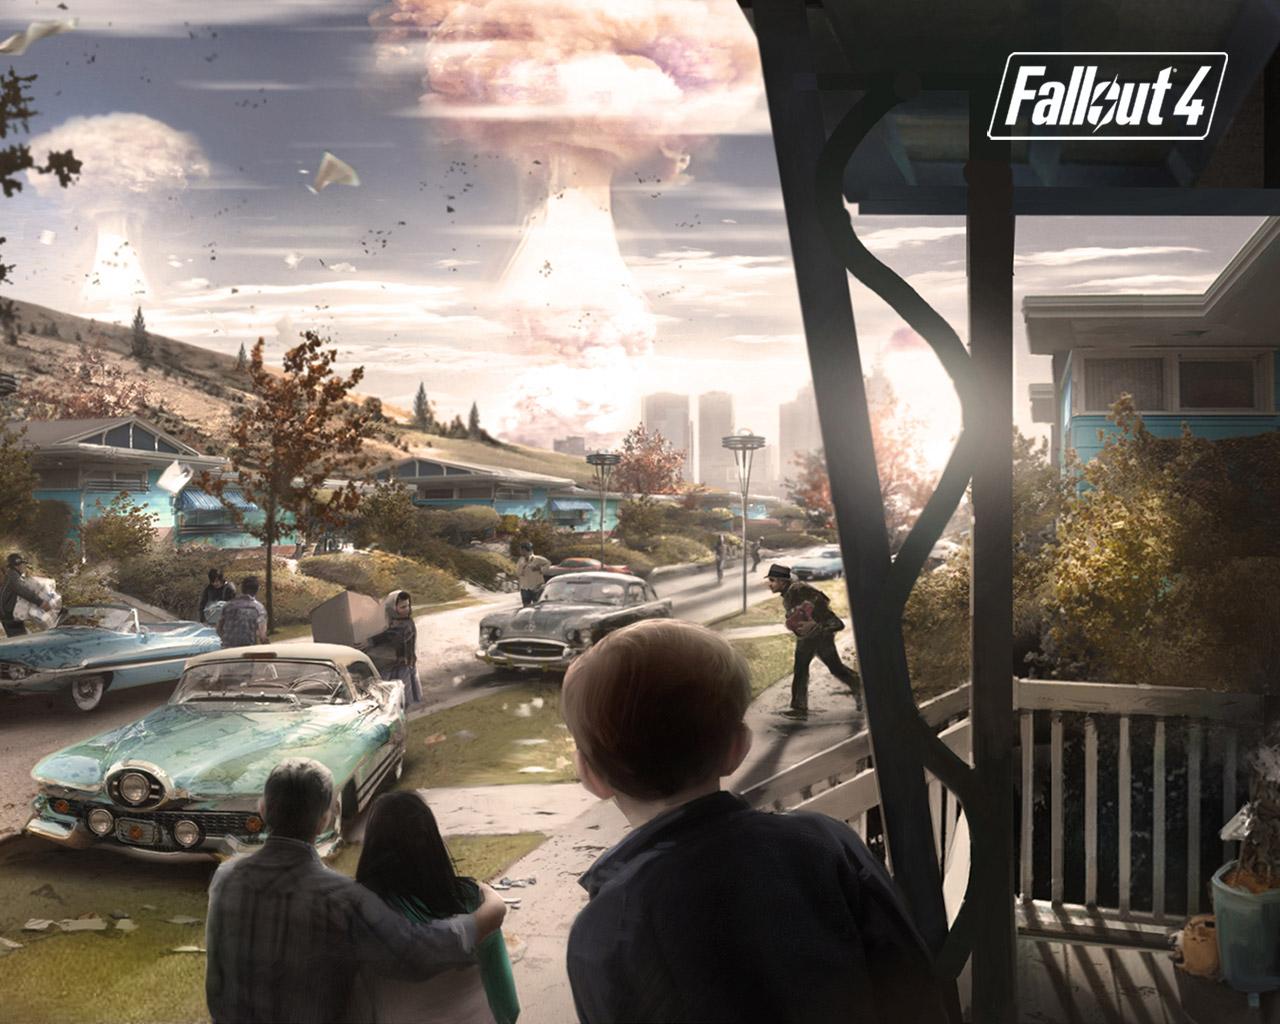 Fallout 4 1280x1024 1280x1024